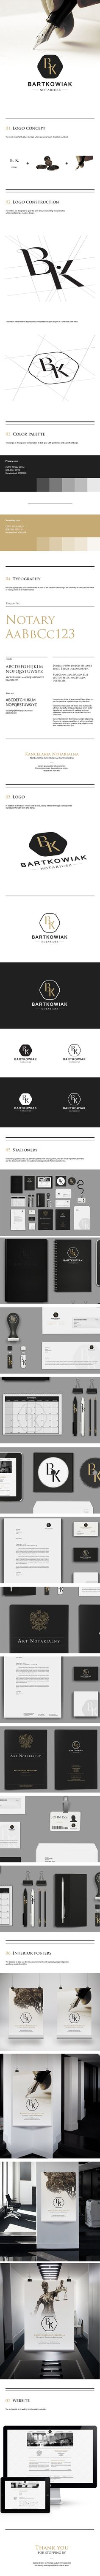 Notary K.Bartkowiak | Designer: Marcin Wisniewski. This one works for me. :-D